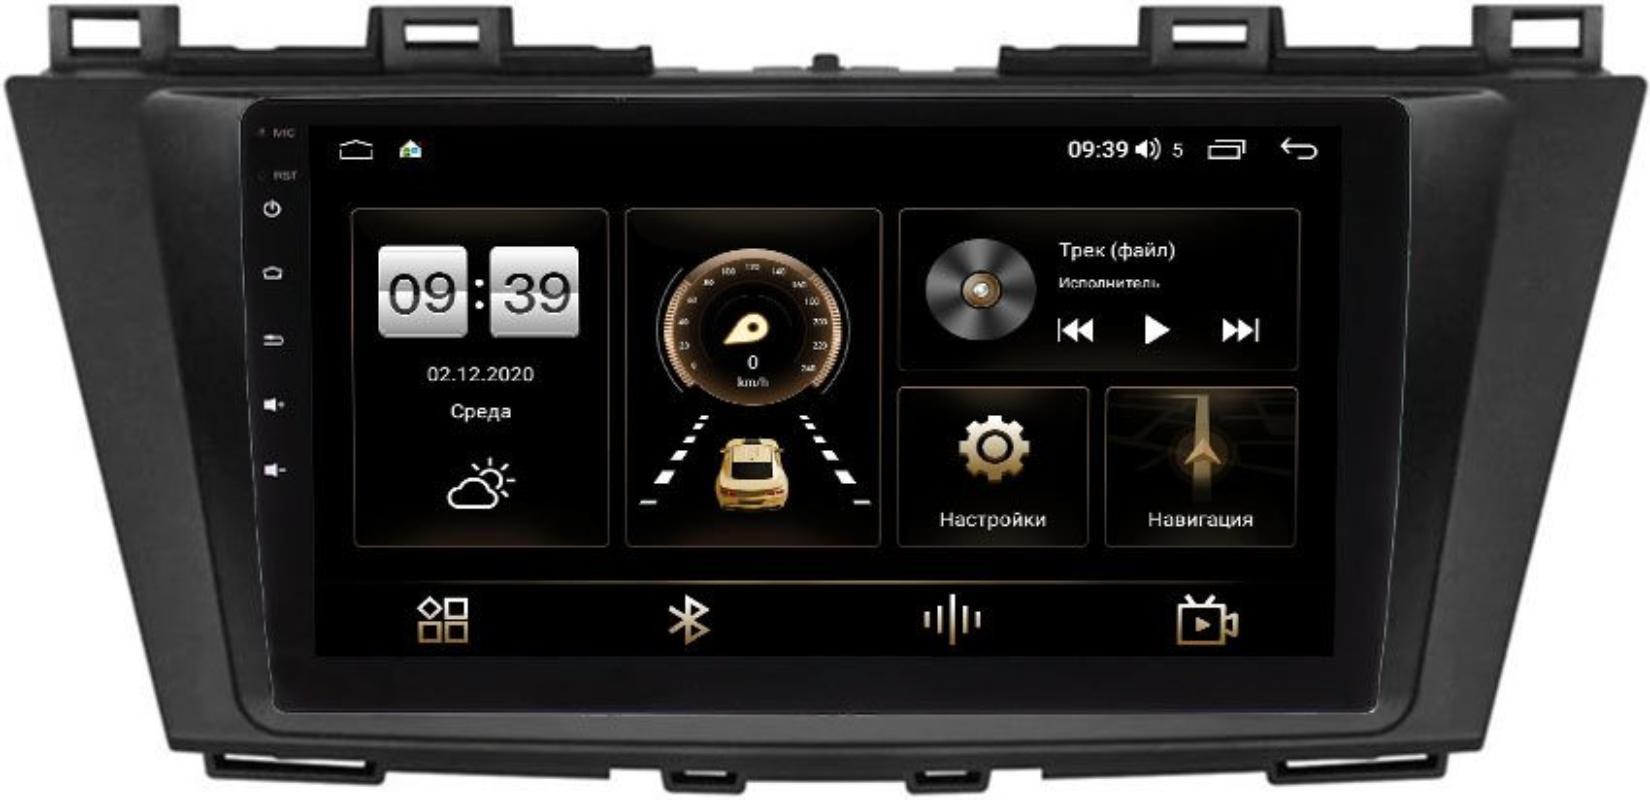 Штатная магнитола LeTrun 4196-9223 для Mazda 5 II (CW), Premacy III (CW) 2010-2017 на Android 10 (6/128, DSP, QLed) С оптическим выходом (+ Камера заднего вида в подарок!)